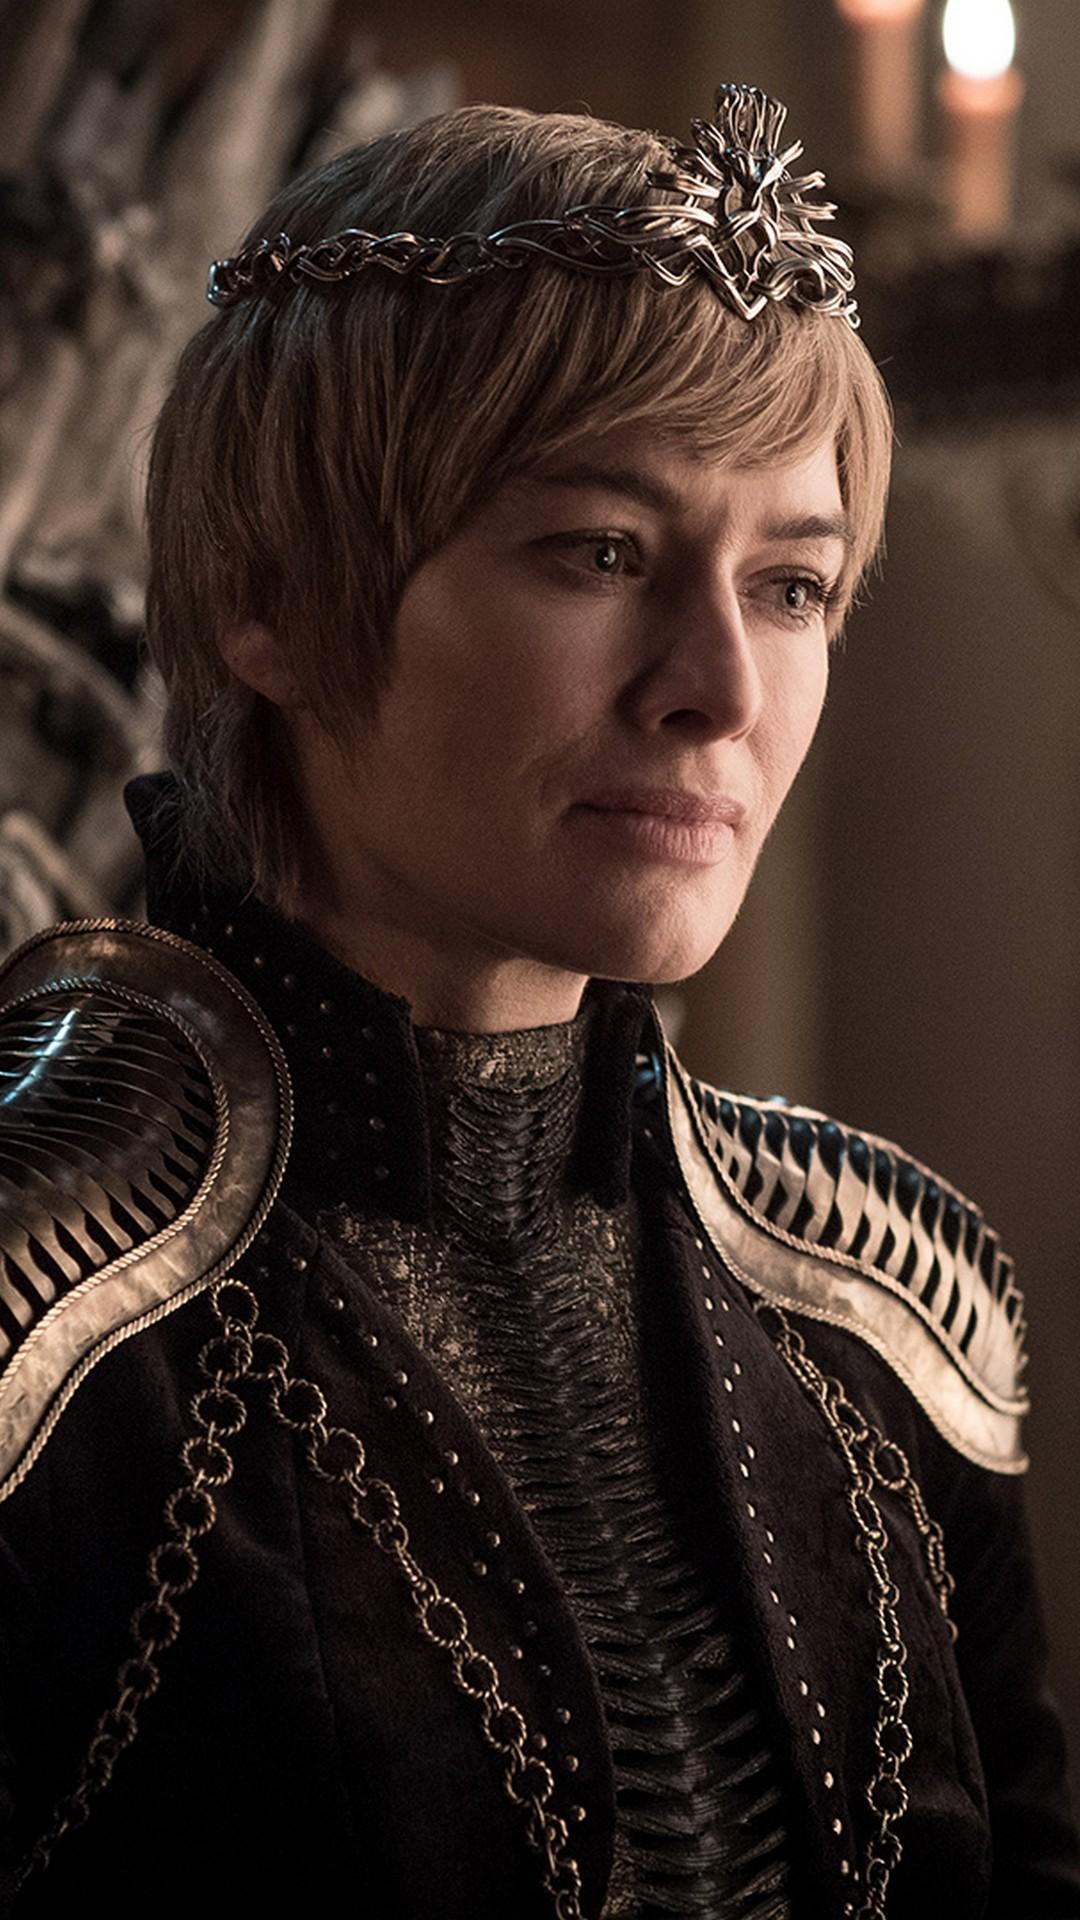 Game Of Thrones Season 8 Wallpaper For Phones With - Game Of Thrones Season8 , HD Wallpaper & Backgrounds